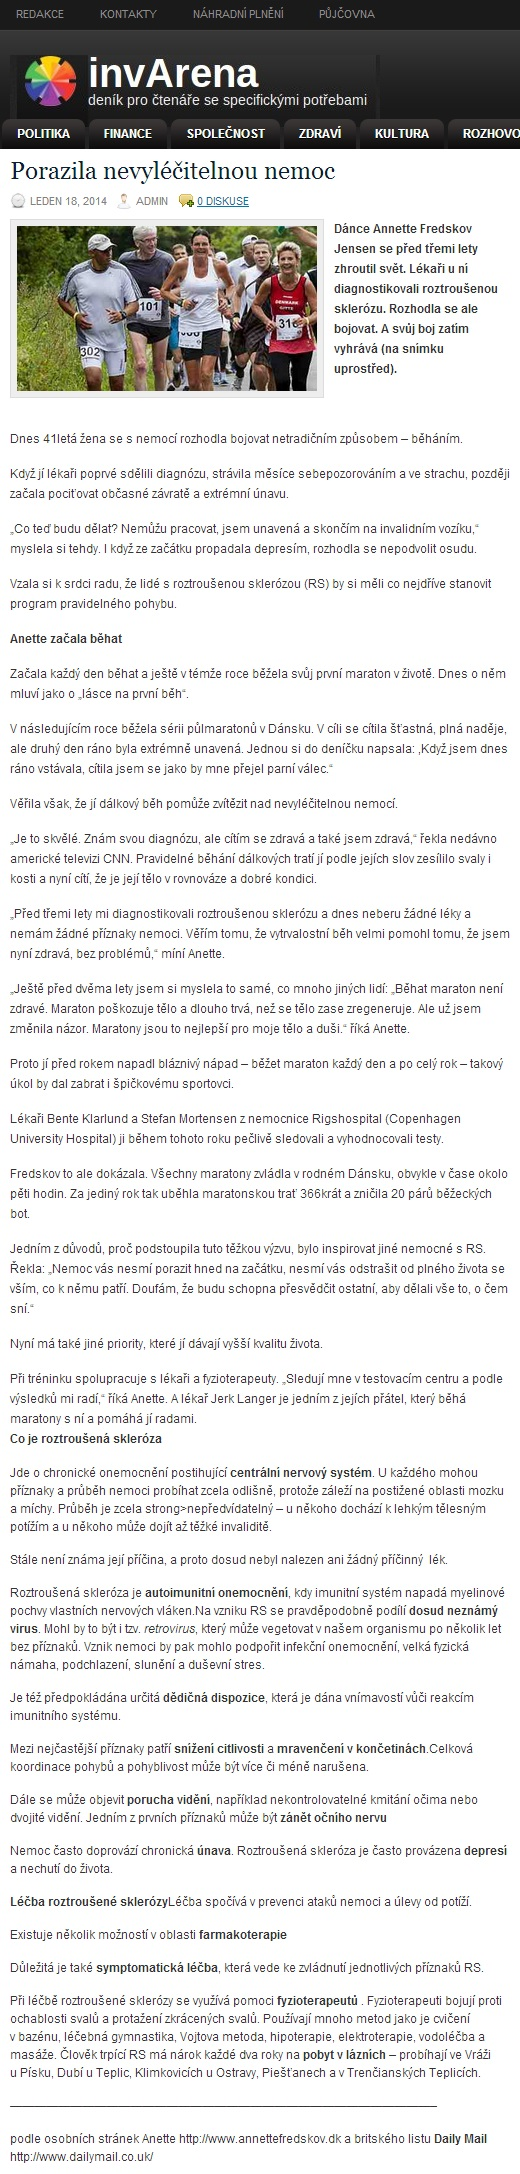 invarena.cz 2014.01.18 tjekkisk